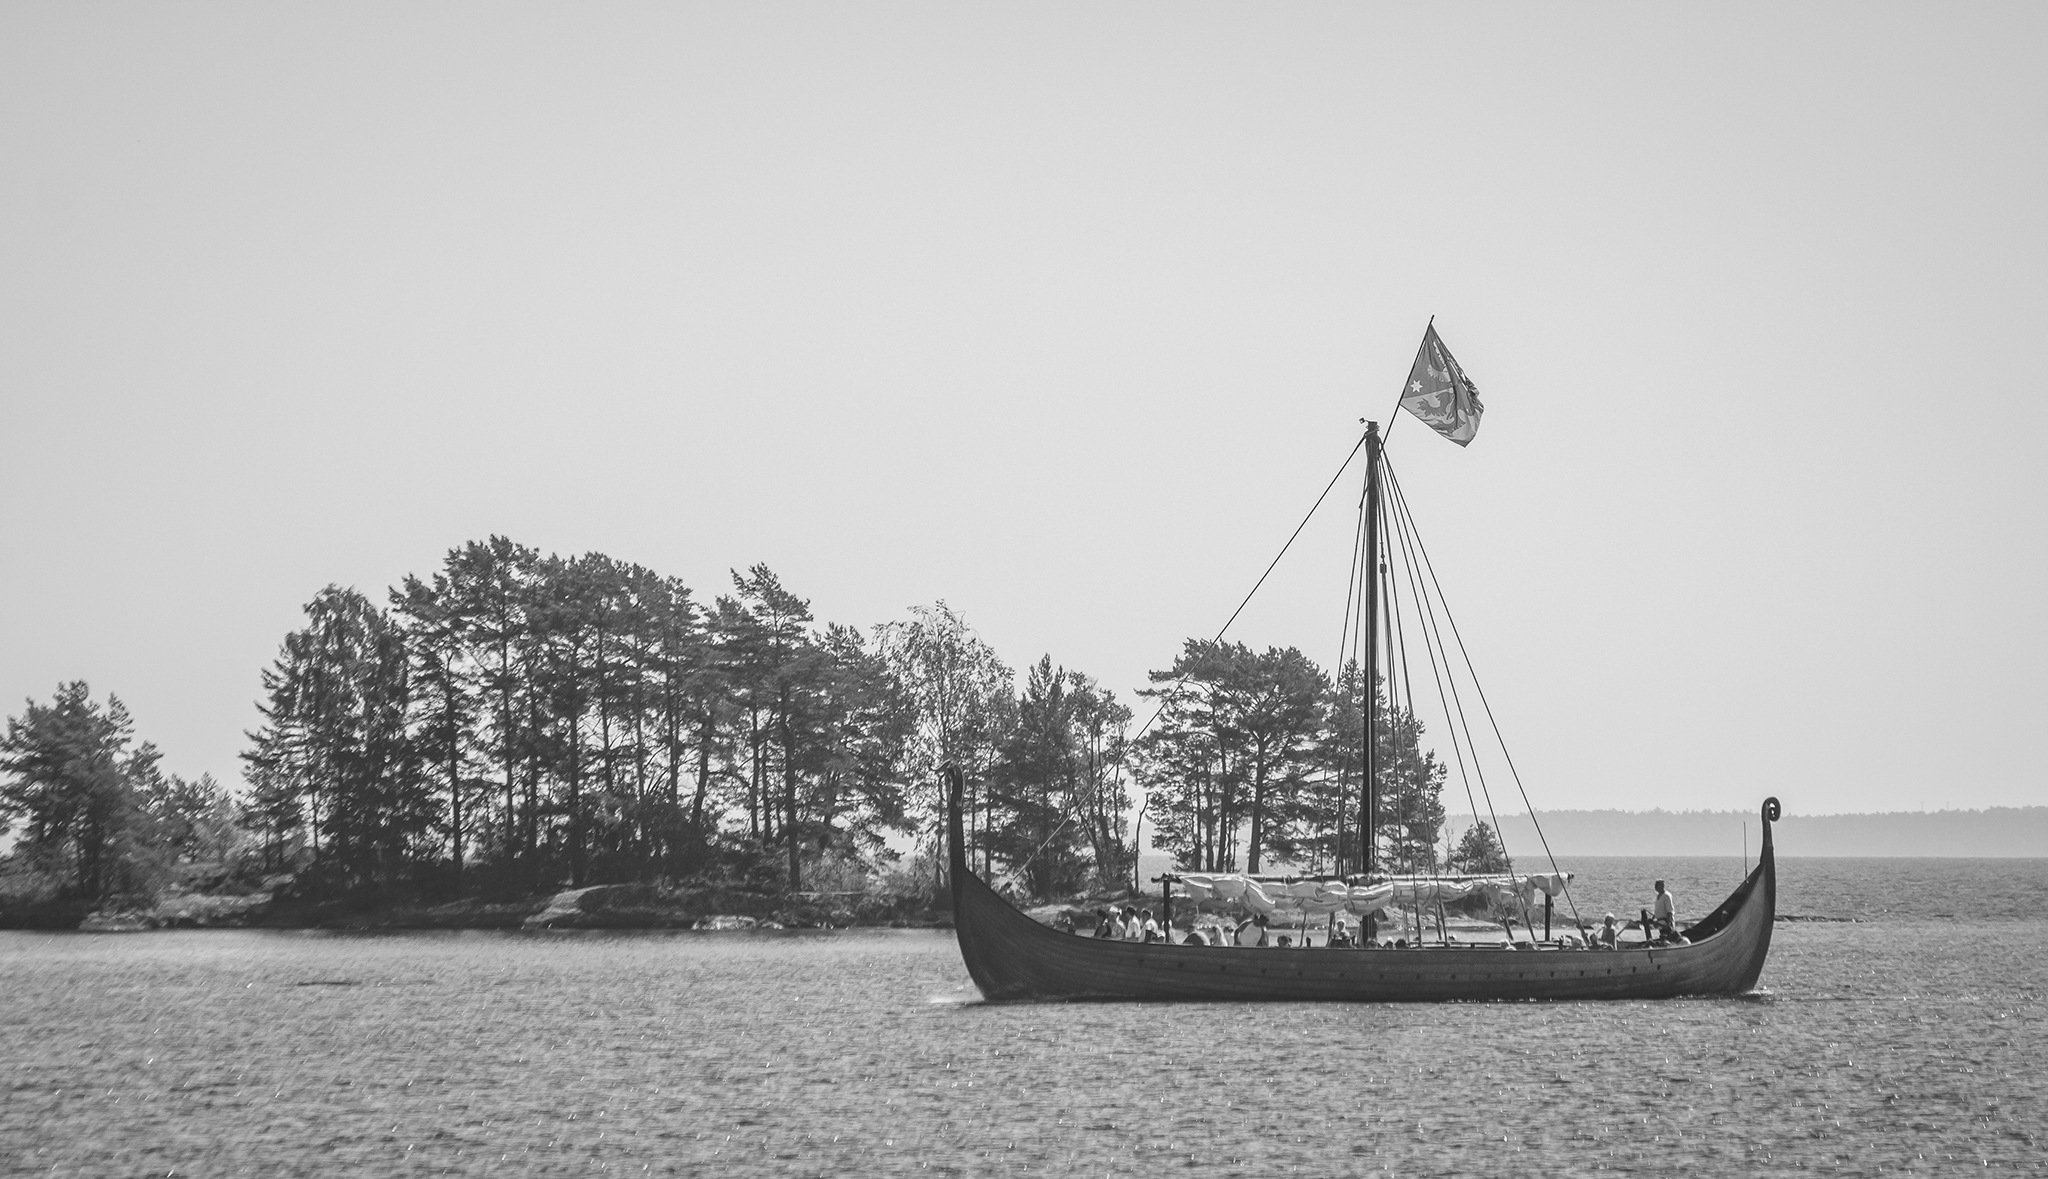 Viking ship by elisah